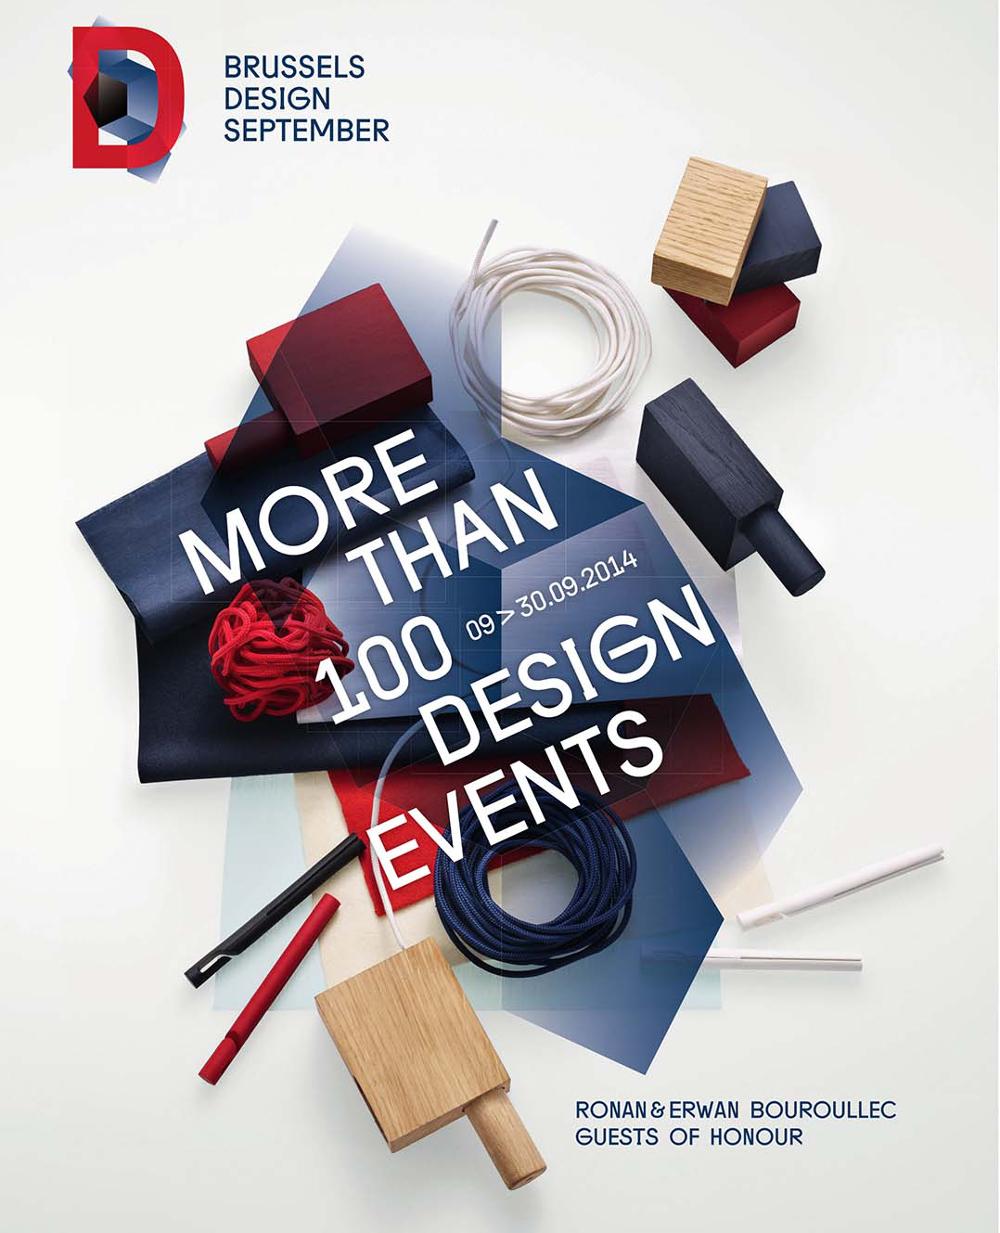 Brussels Design September 2015 en approche